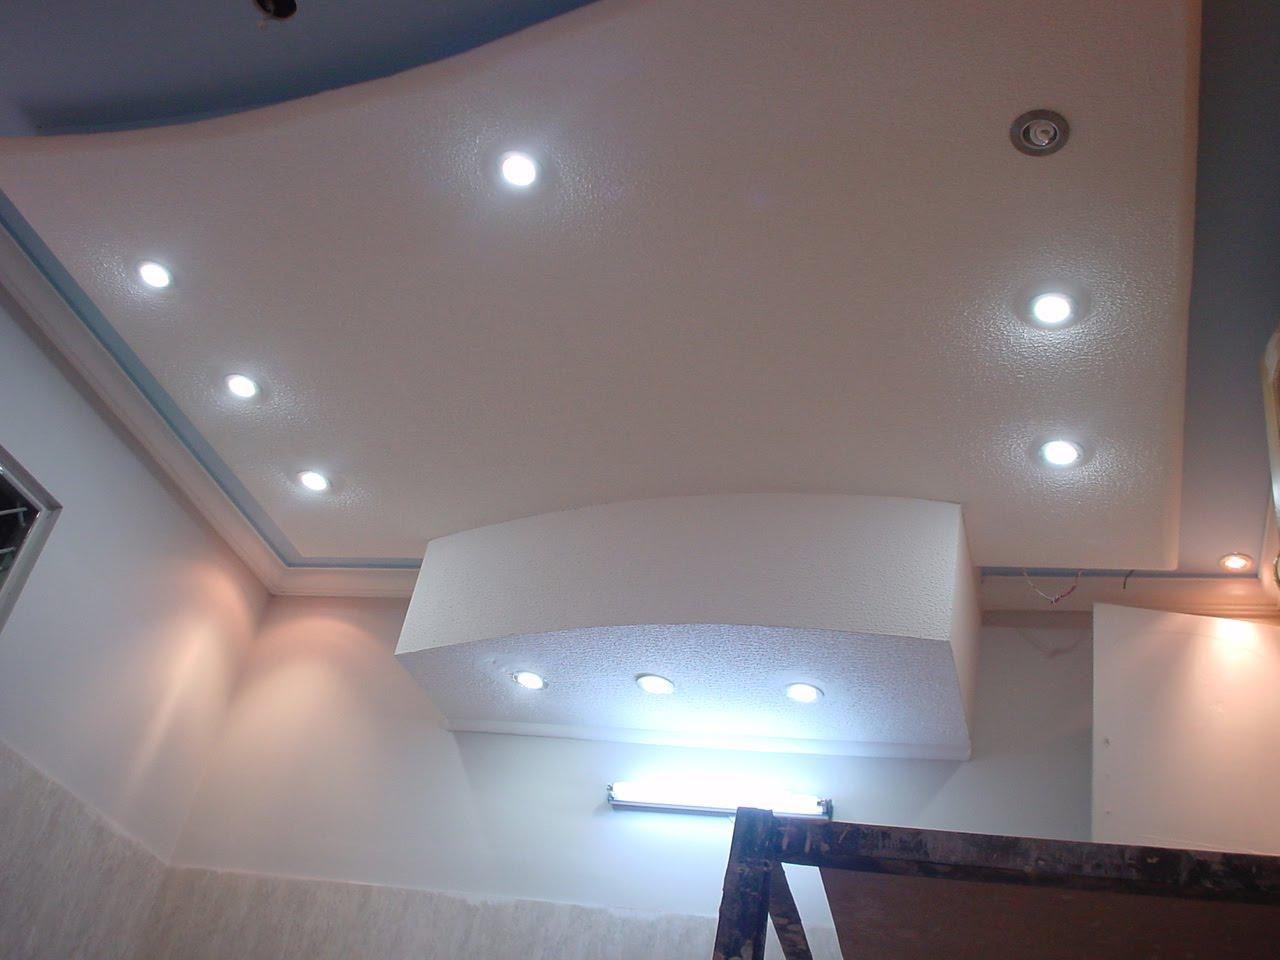 Plaster Of Paris Ceiling Moulding Designs | Joy Studio Design Gallery ...